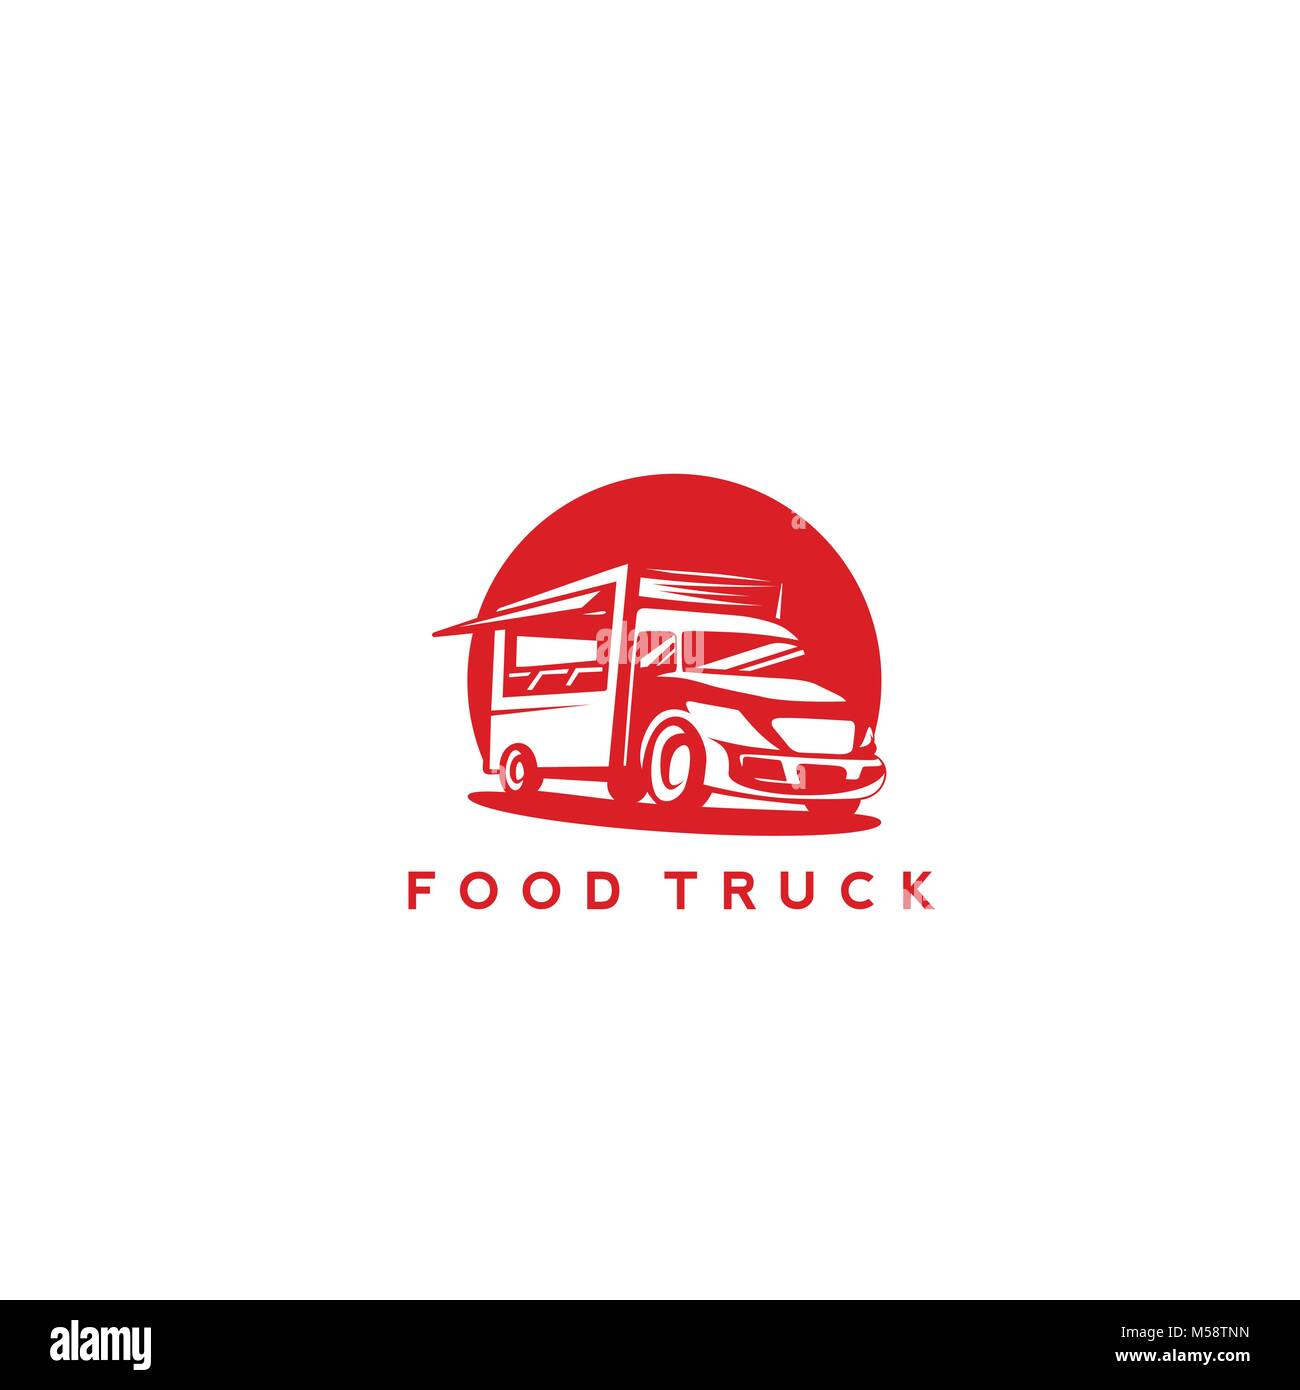 Red food truck vector illustration - Stock Vector